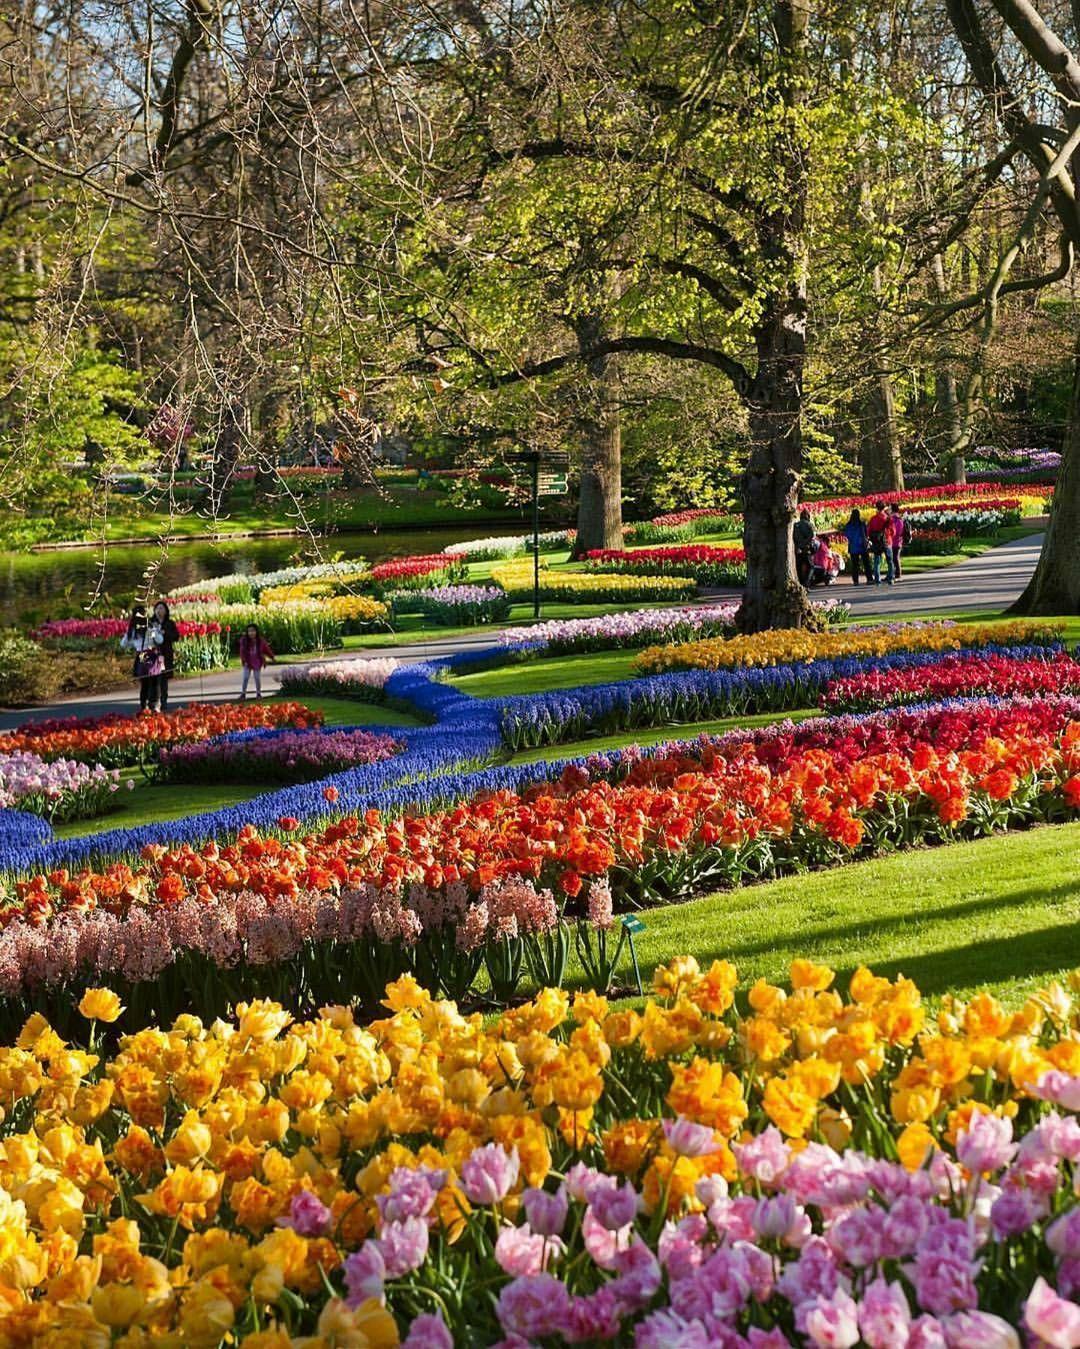 Beautiful Flowers During The Tulip Bloom At Keukenhof ... concernant Jardin De Keukenhof